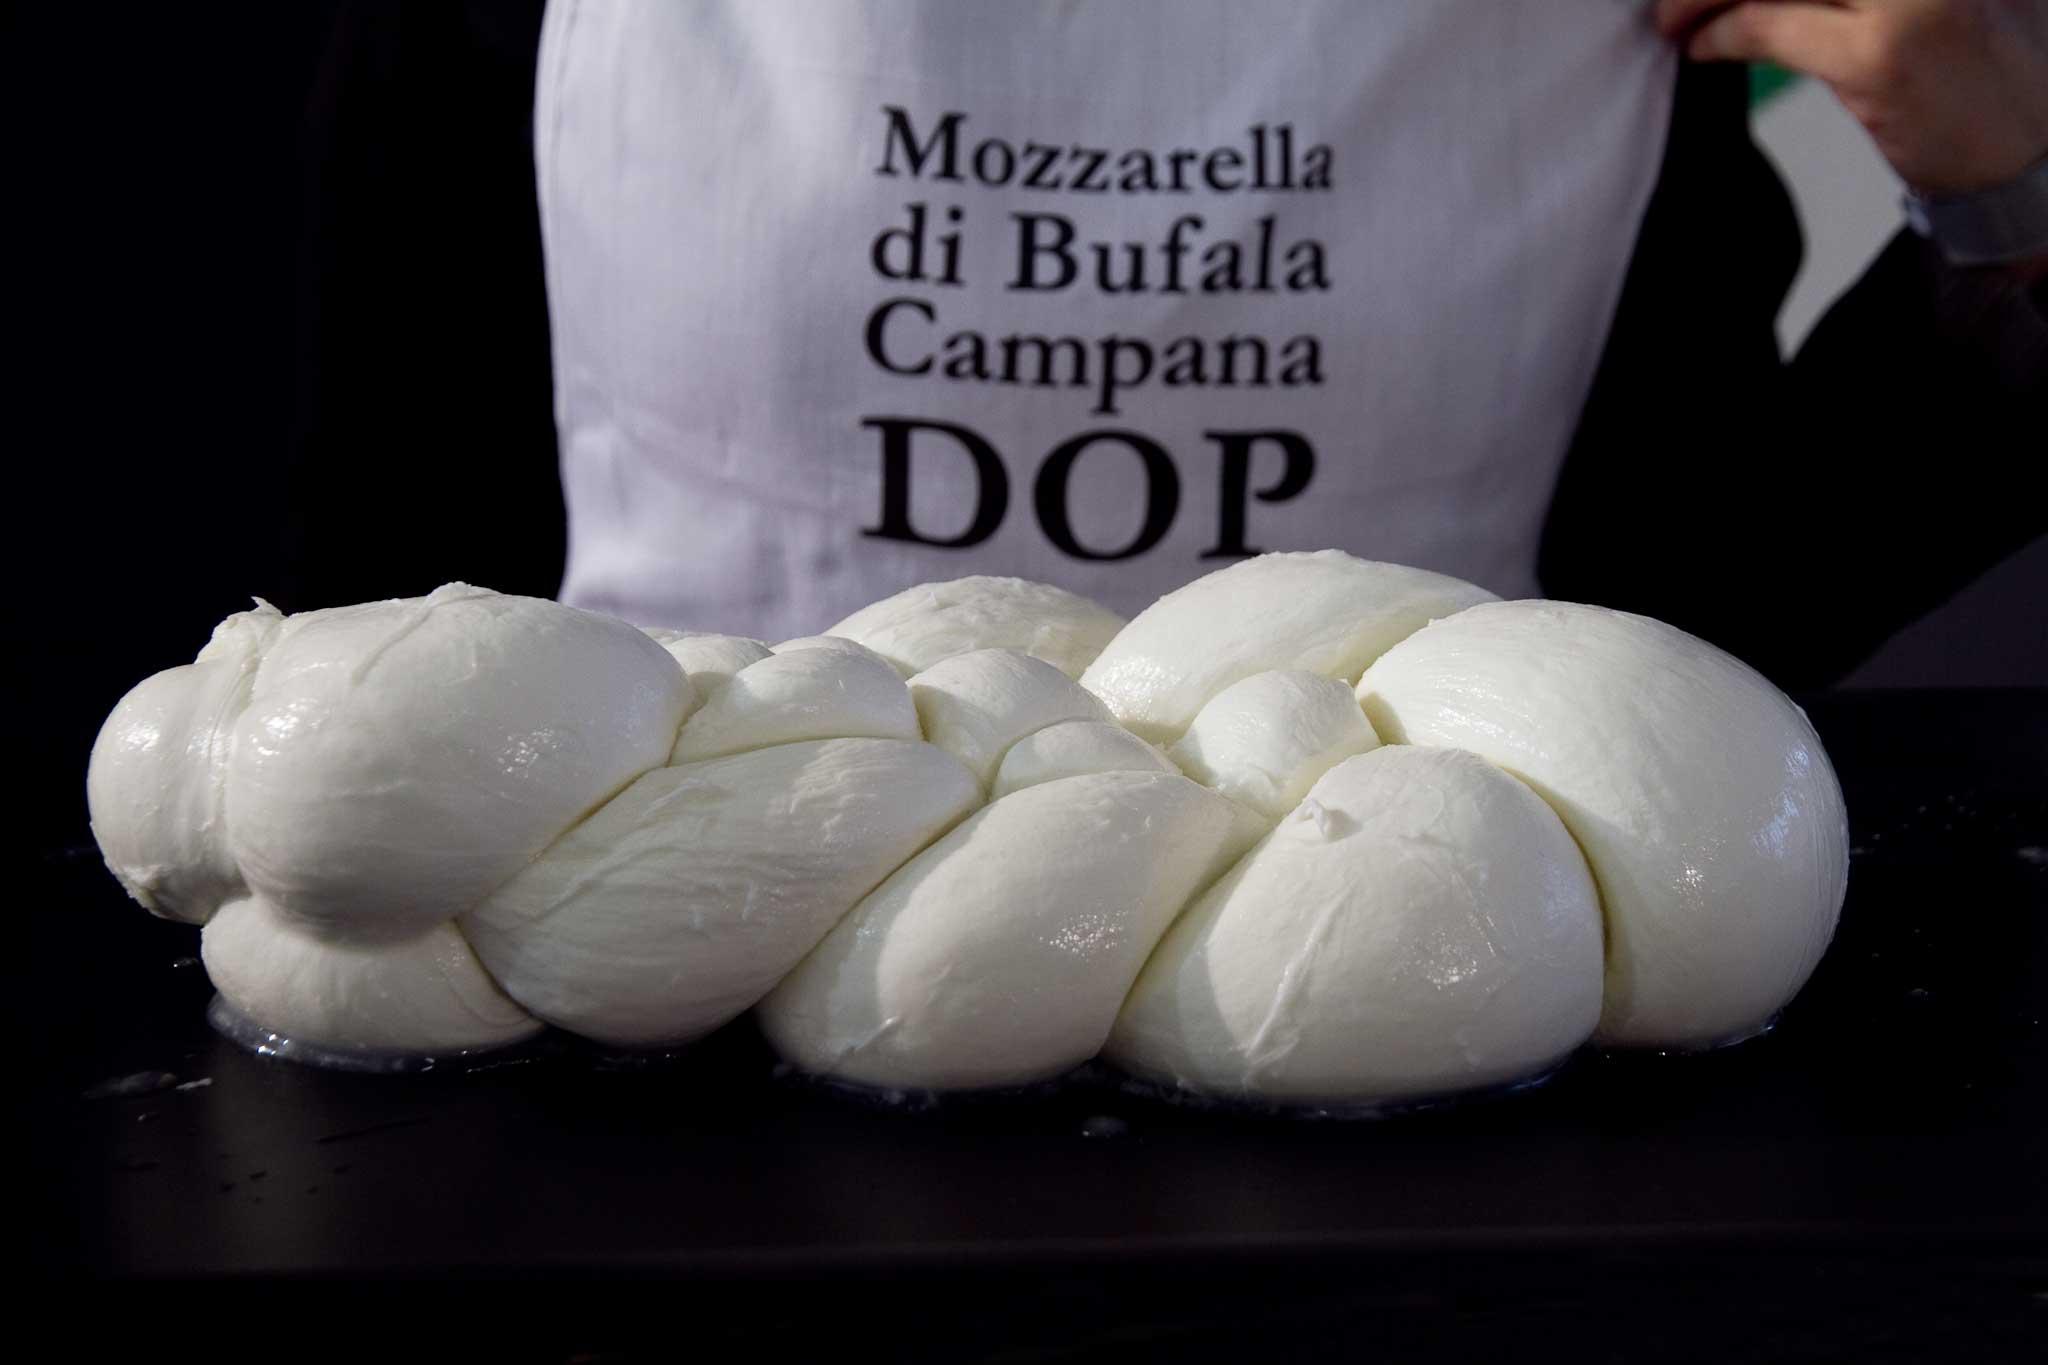 Mozzarella dop